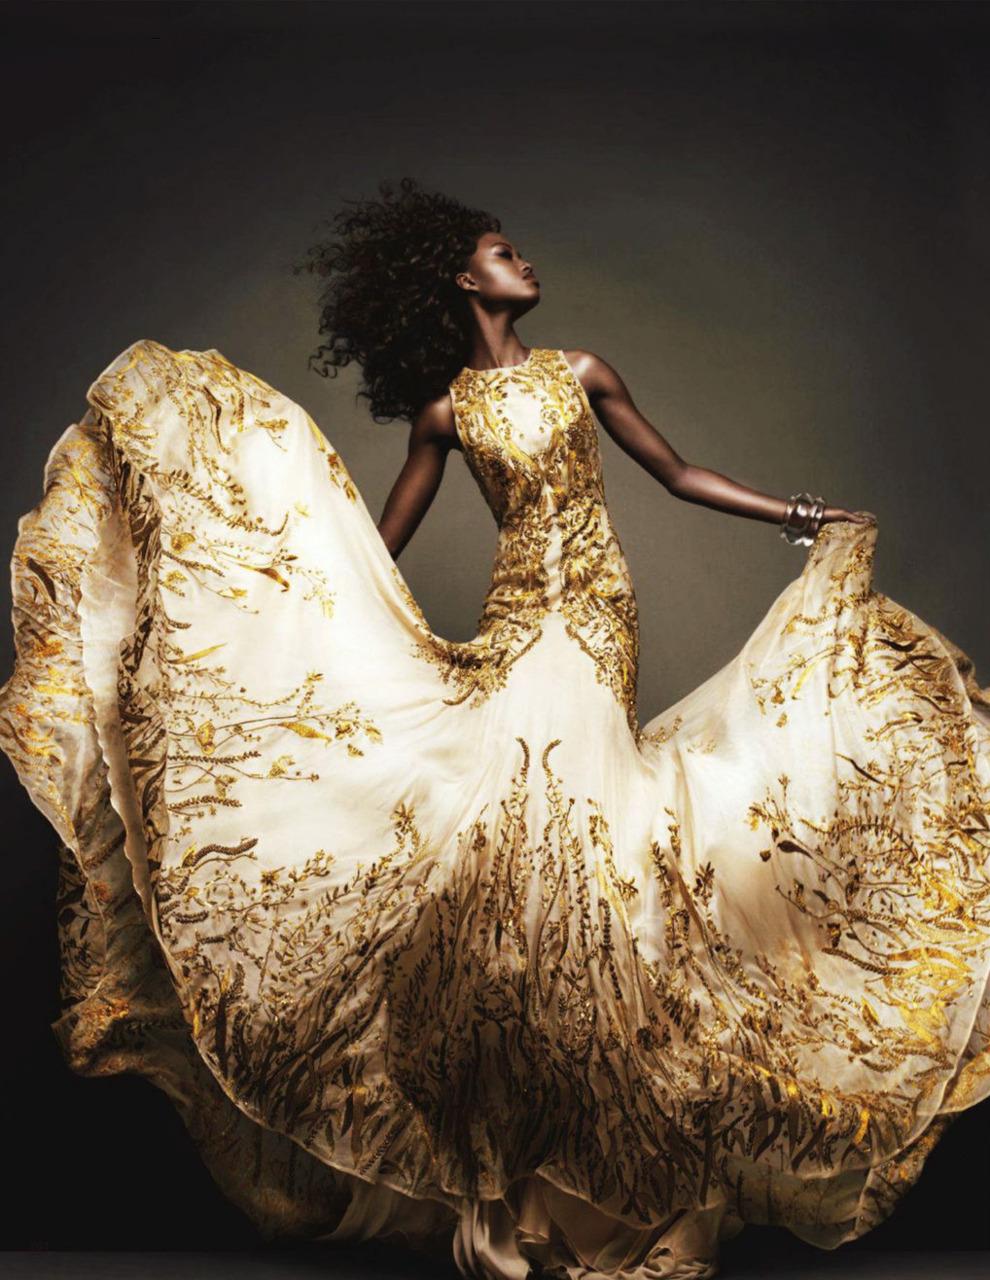 Zimbabwean model Nyasha Matonhodze in Alexander McQueen.